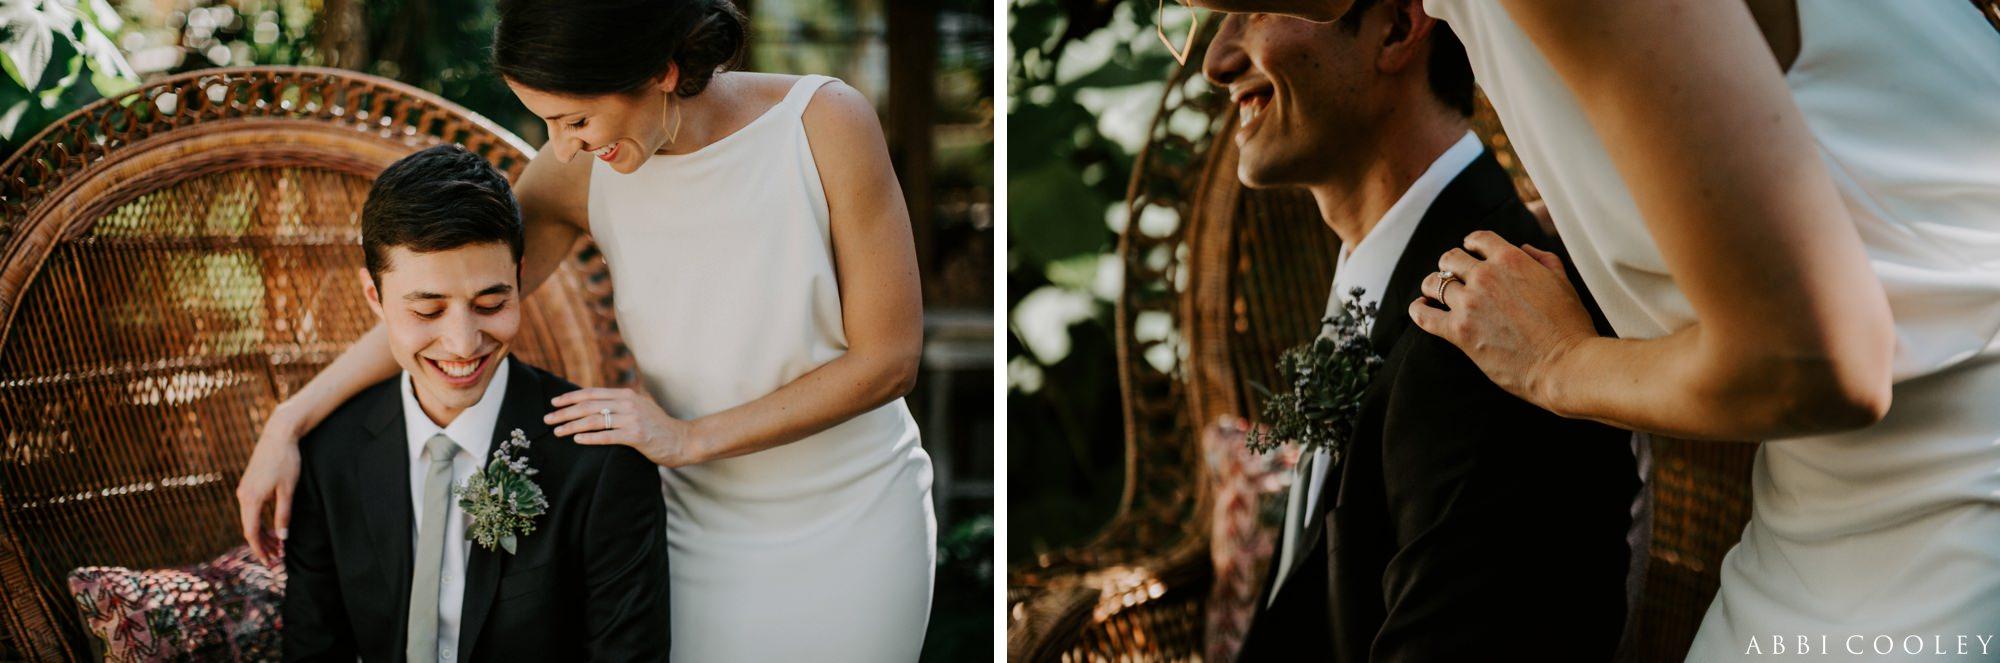 ABBI COOLEY PALM SPRINGS WEDDING_0793